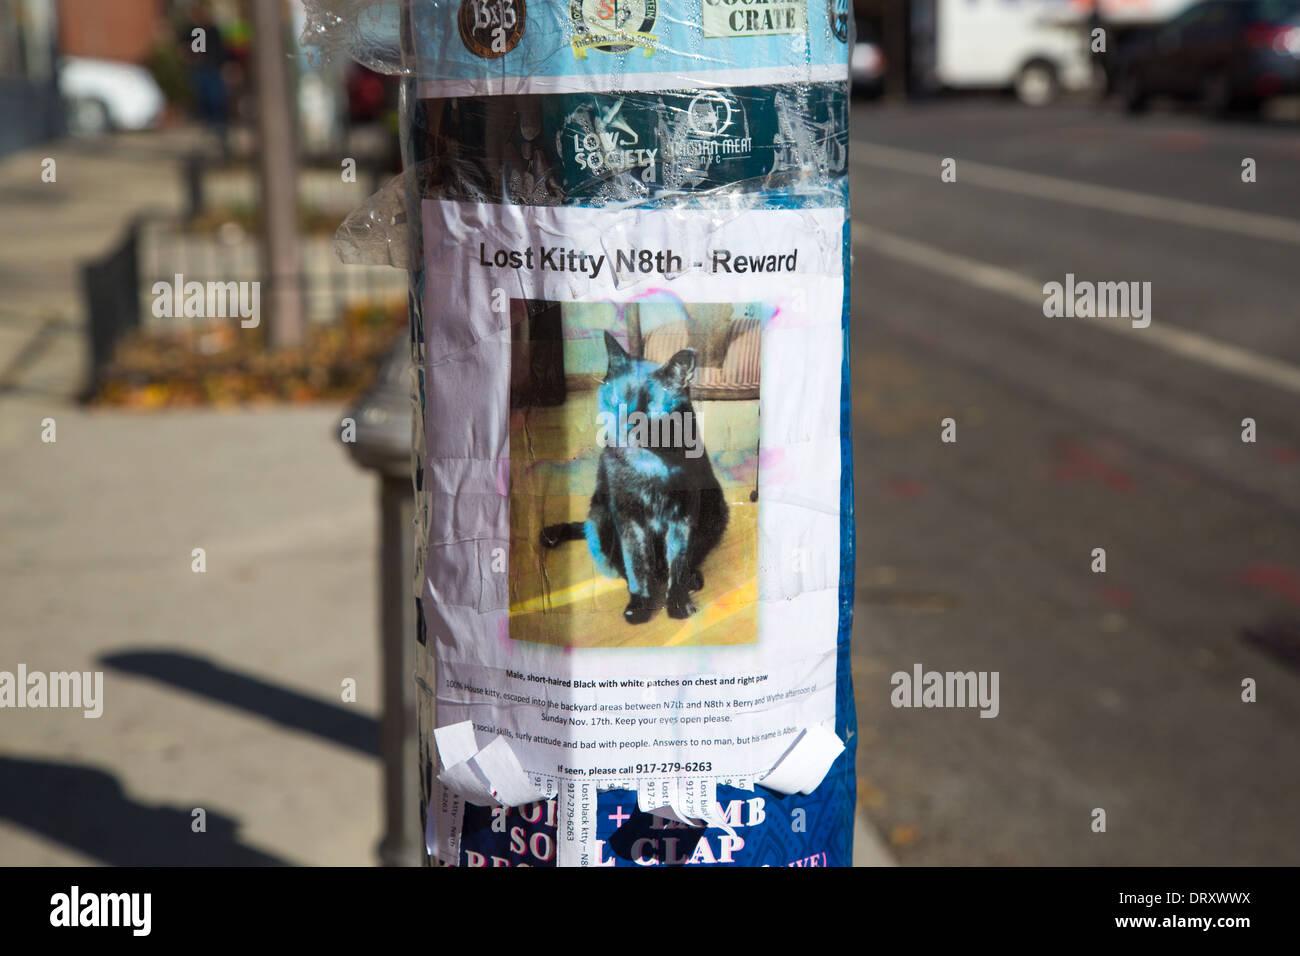 Verlorene Katze Poster, Brooklyn, NYC Stockbild